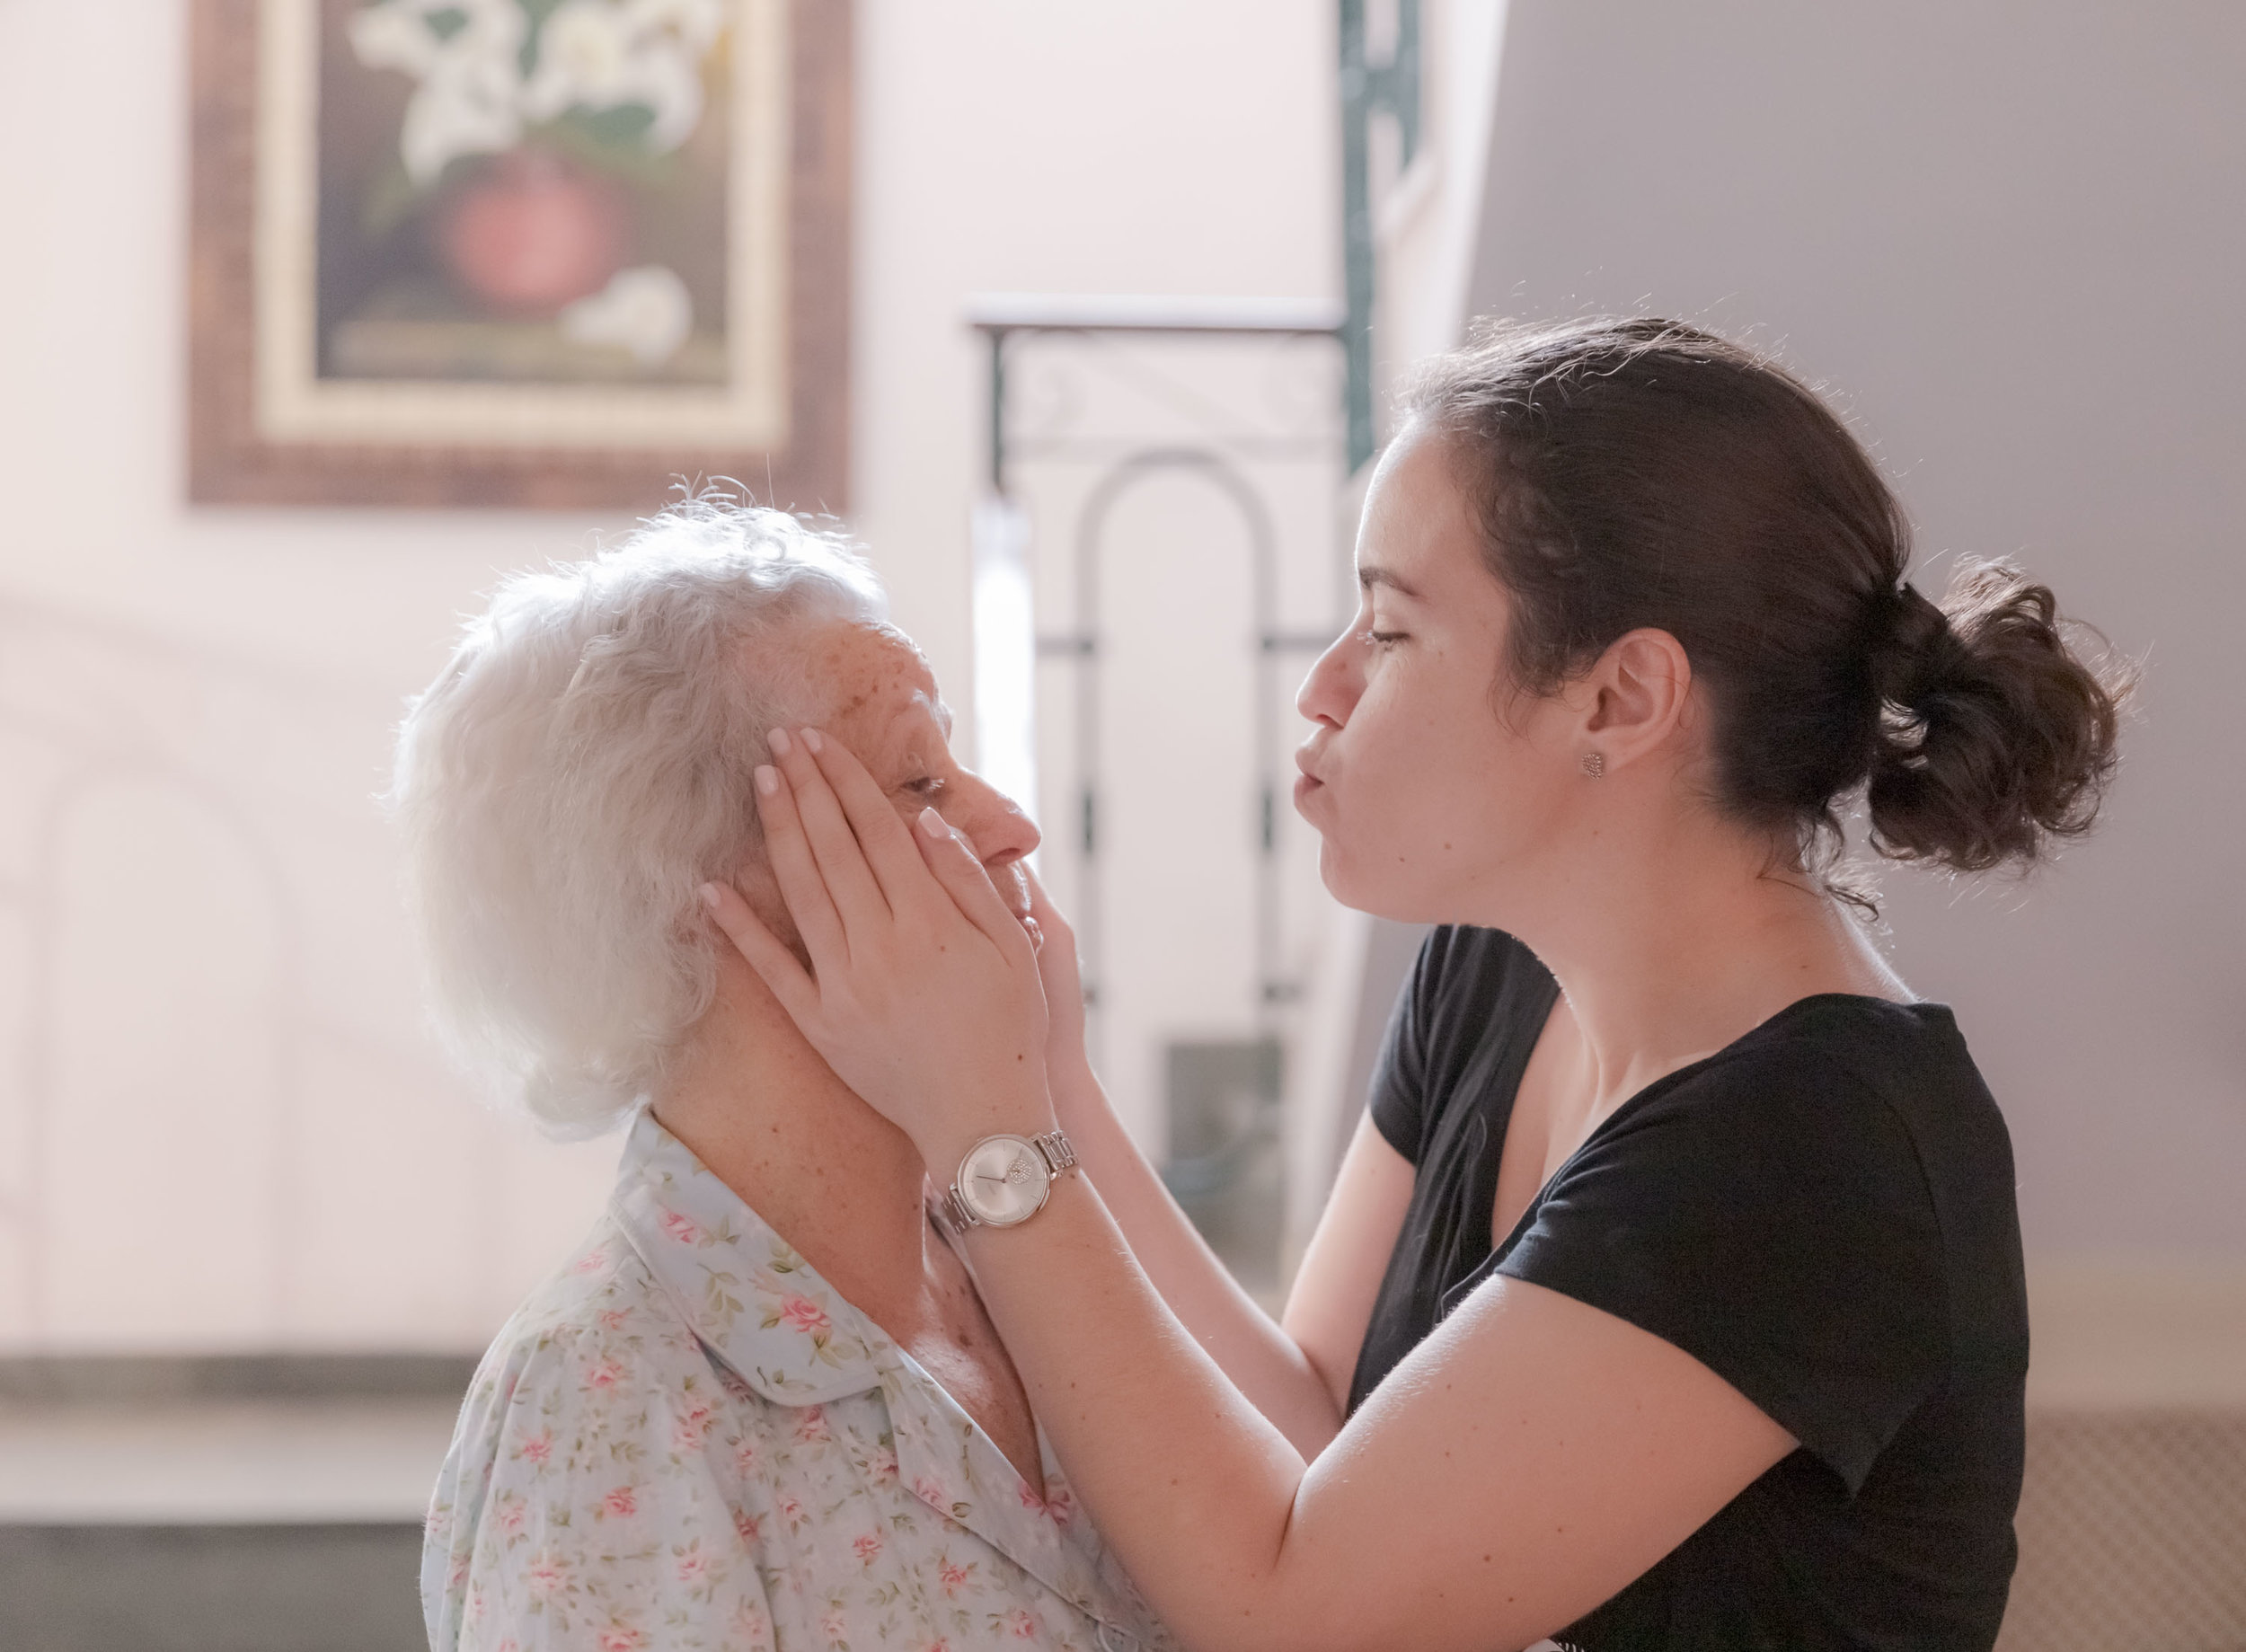 grandmother-and-granddaughter.jpg